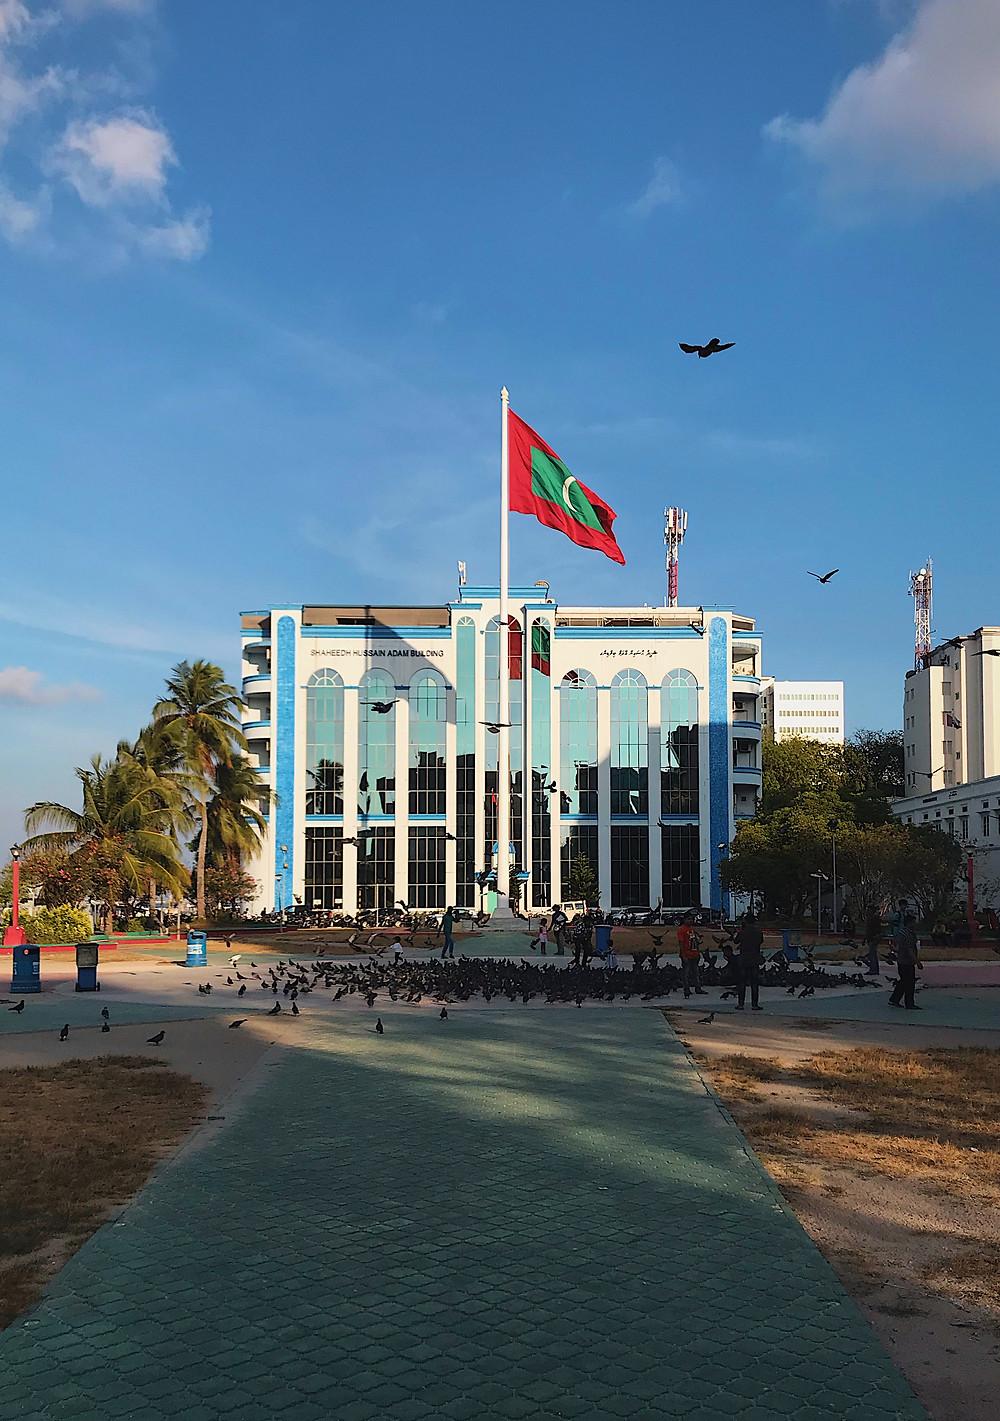 Jumhooree Maidhaan, The Maldives' capital of Male